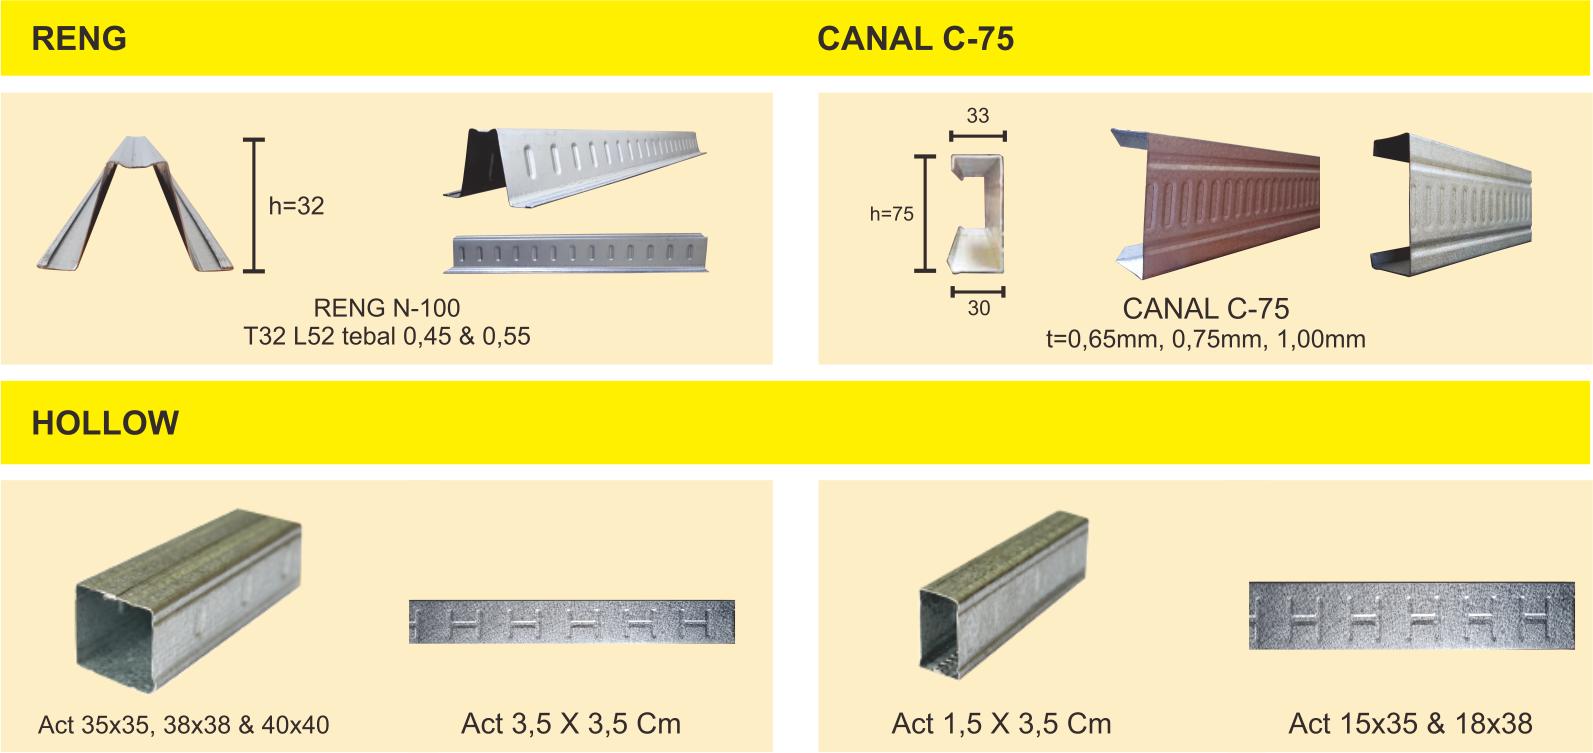 kanal c baja ringan surabaya asia bangun karya distributor bahan bangunan kerangka atap